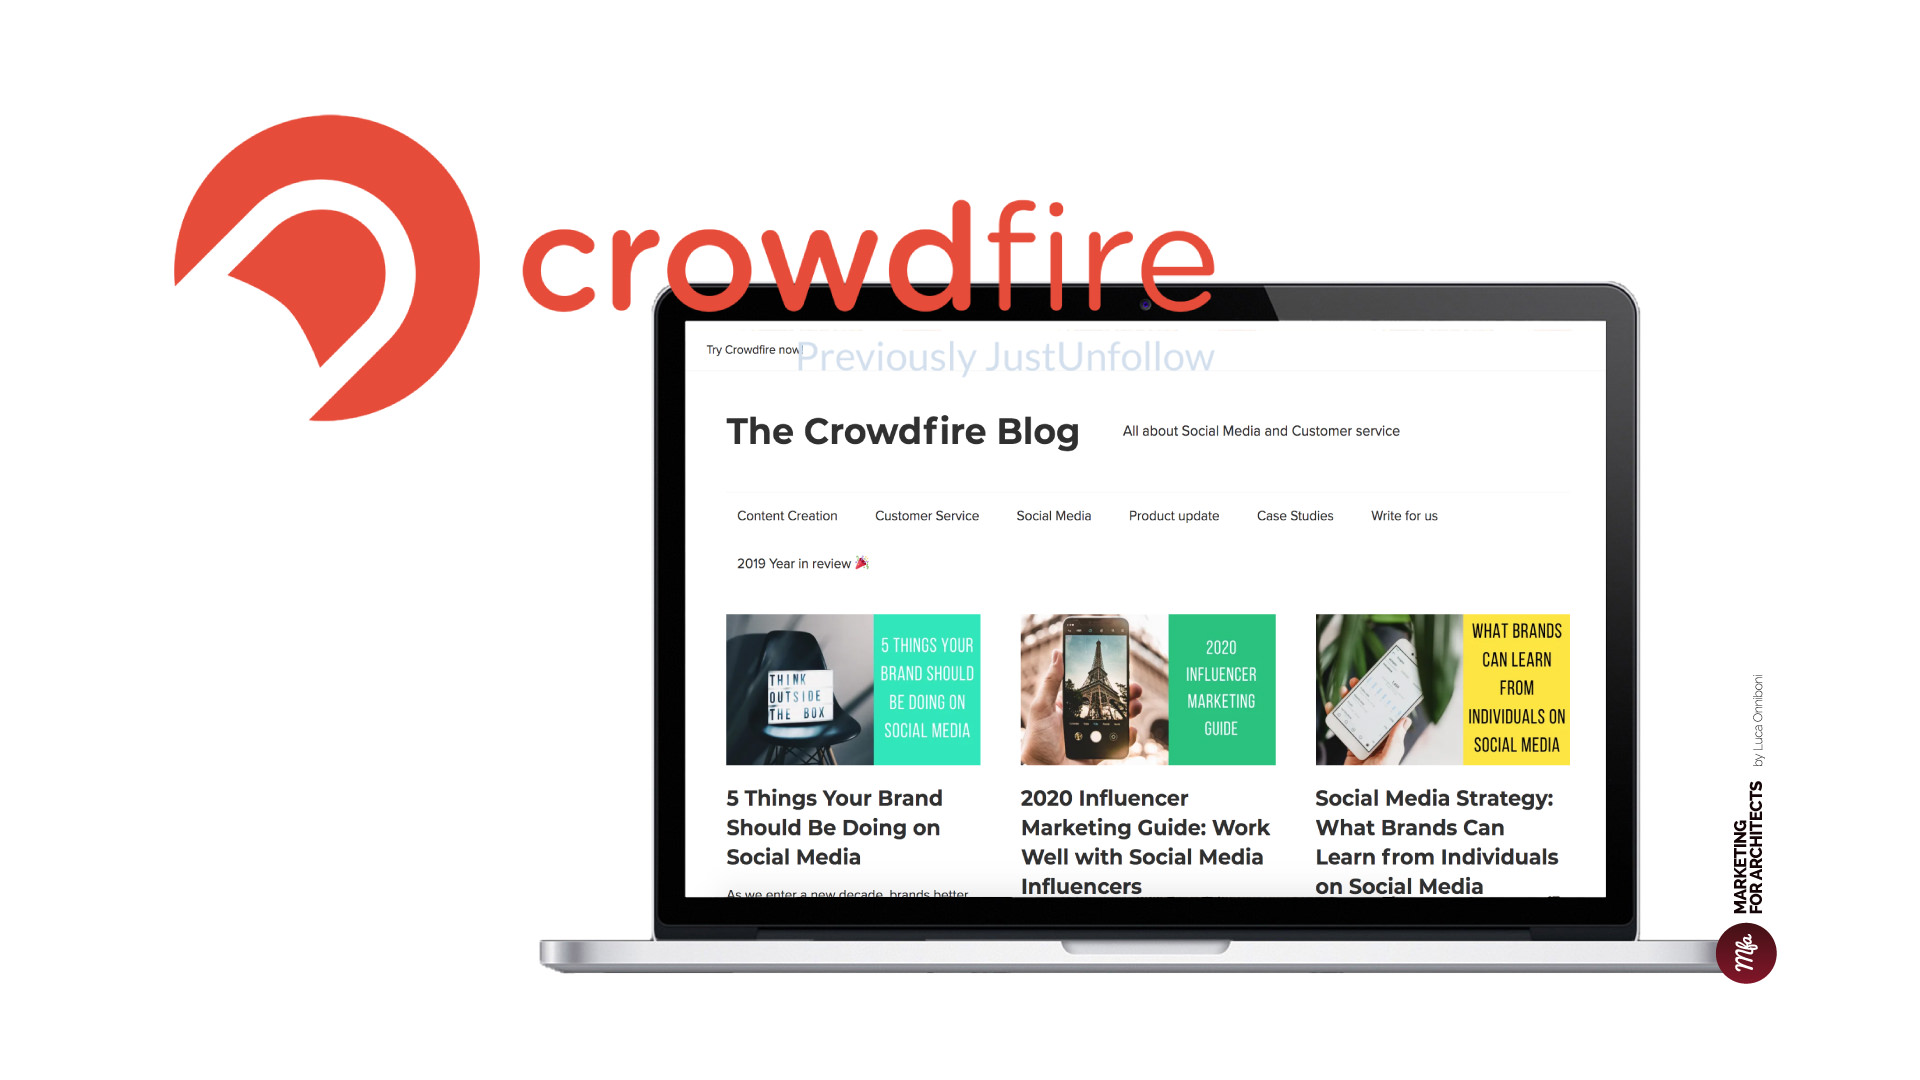 crowdfire blog